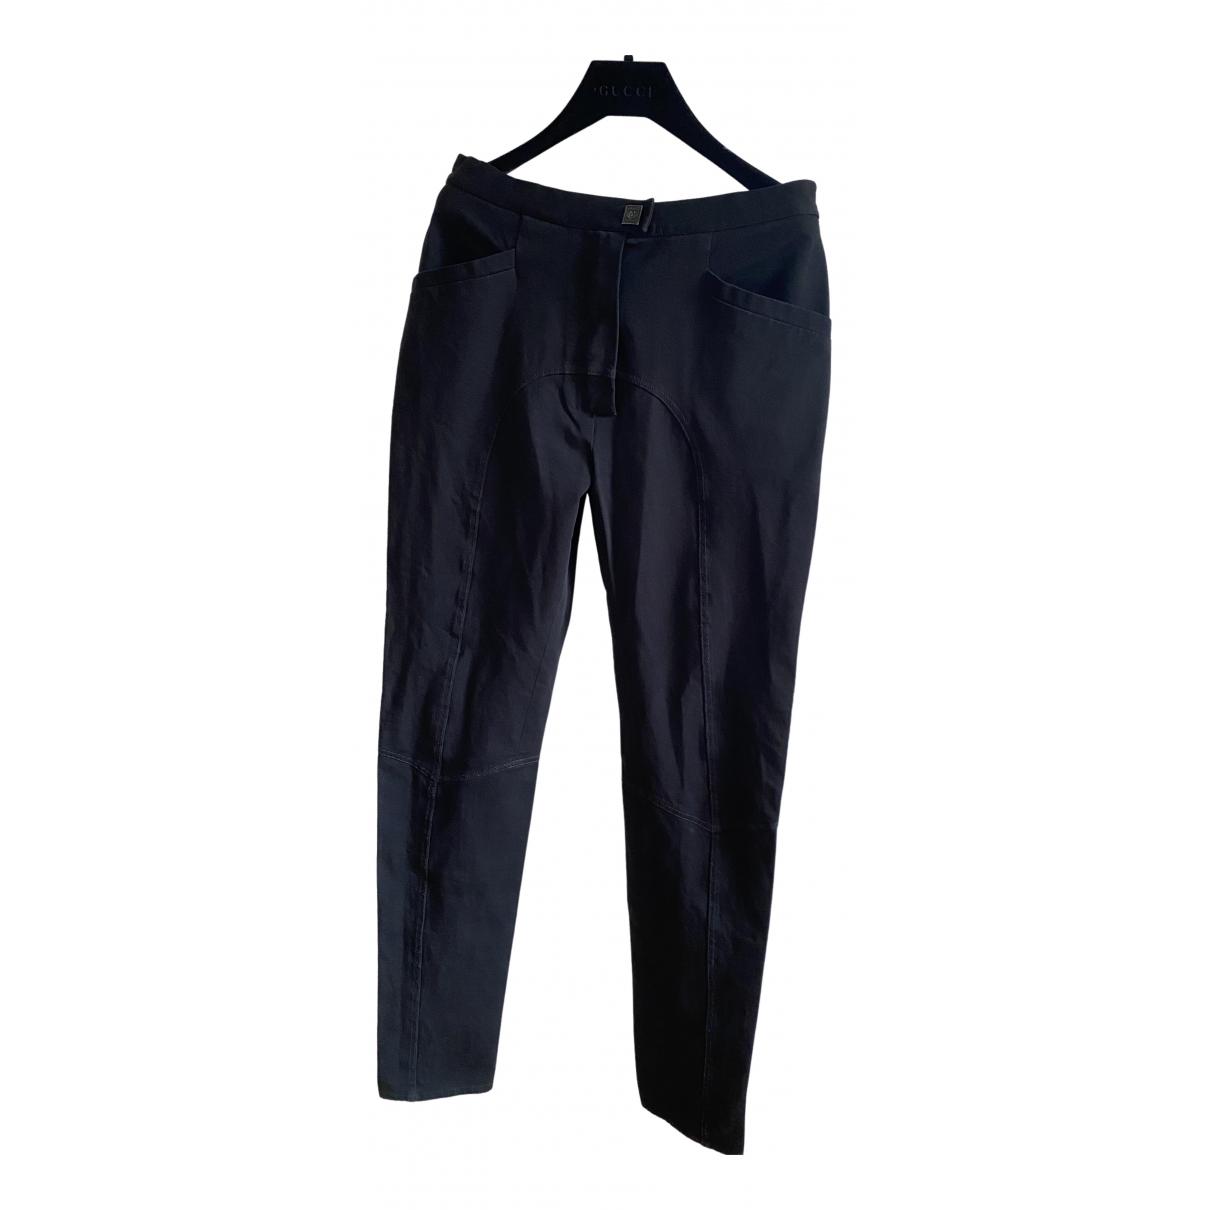 Pantalon pitillo Chanel